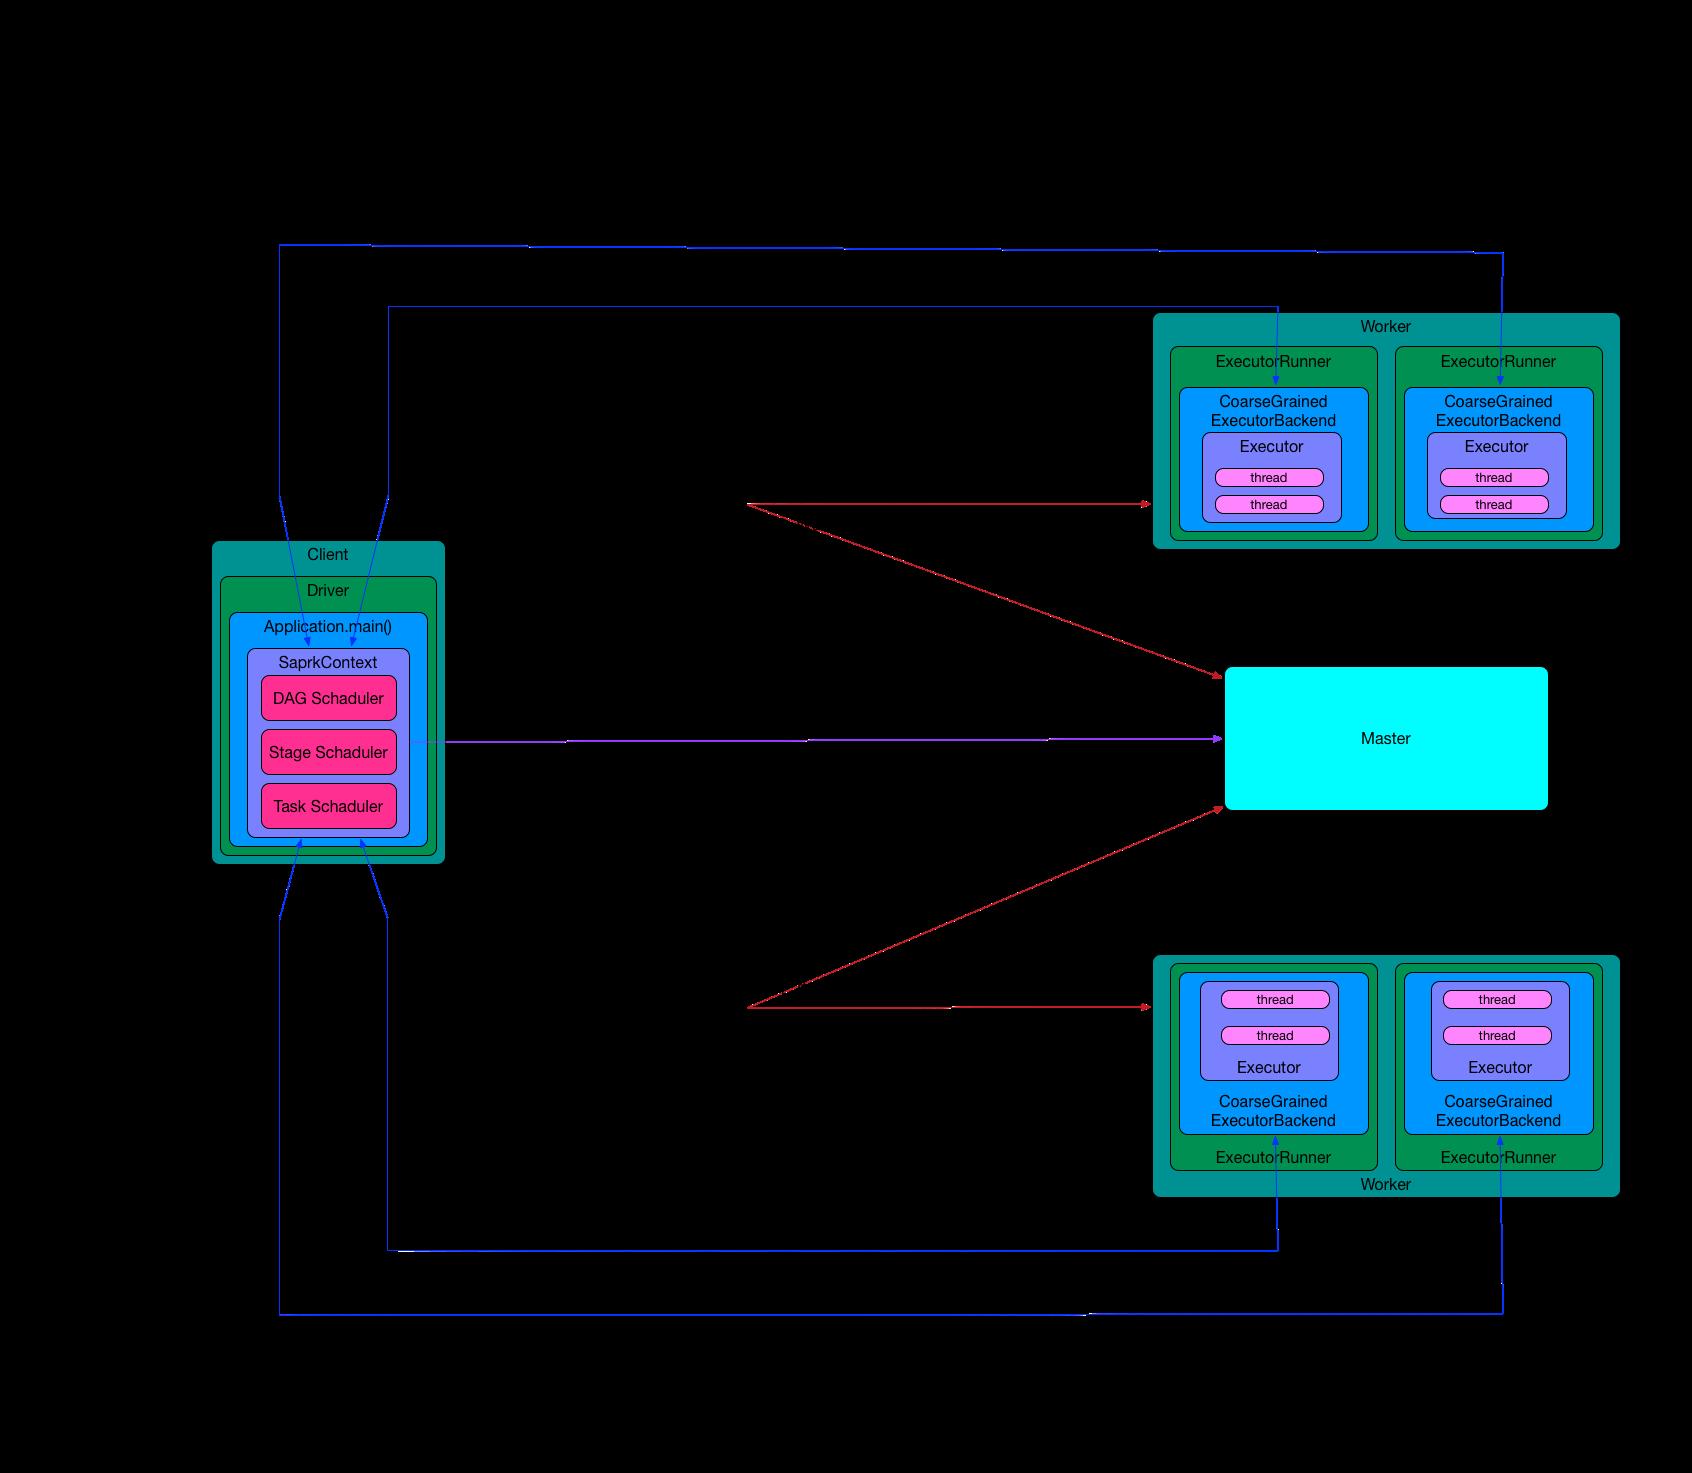 Spark Standalone模式运行调度图